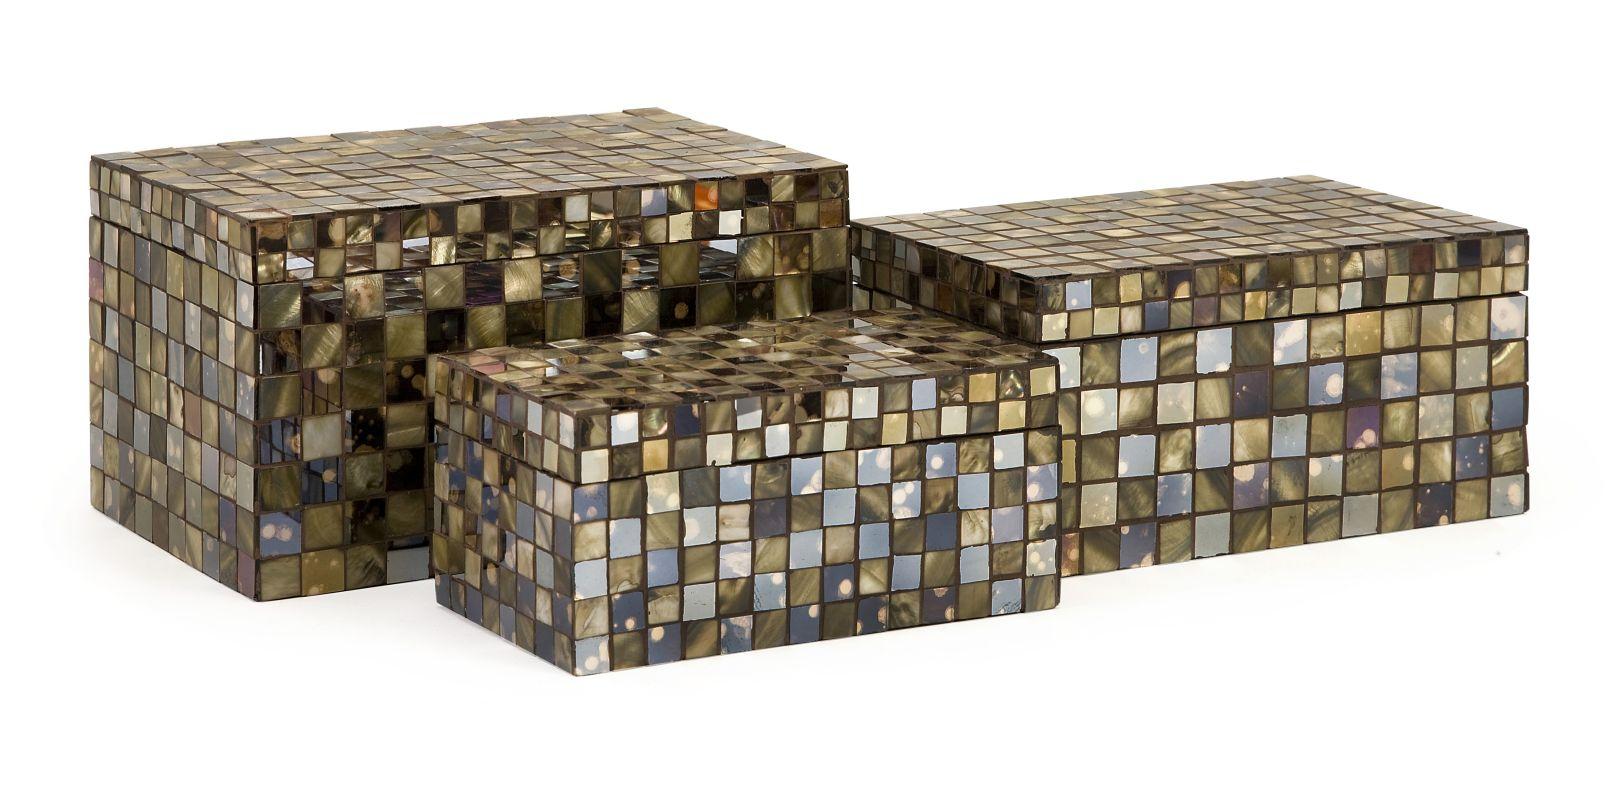 IMAX Home 1973-3 Noida Mosaic Boxes - Set of 3 Home Decor Boxes